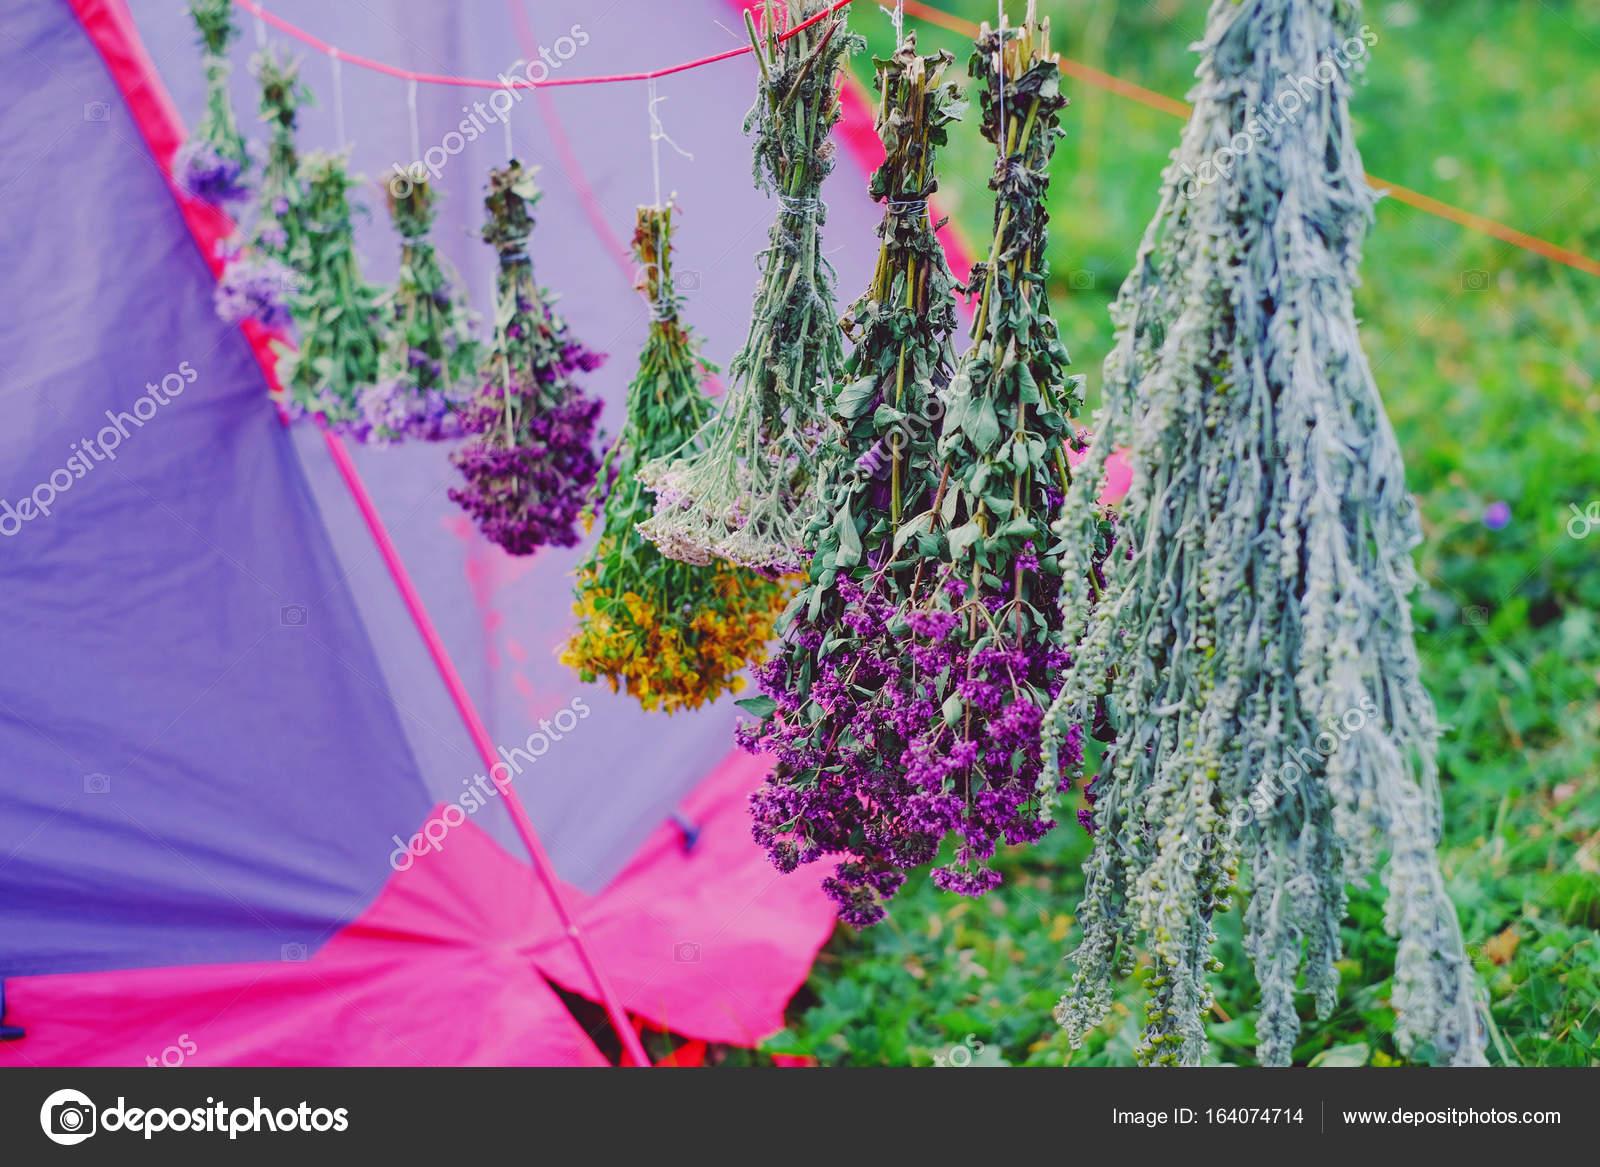 Pflanzen Trocknen therapeutischen pflanzen trocknen stockfoto qzian 164074714